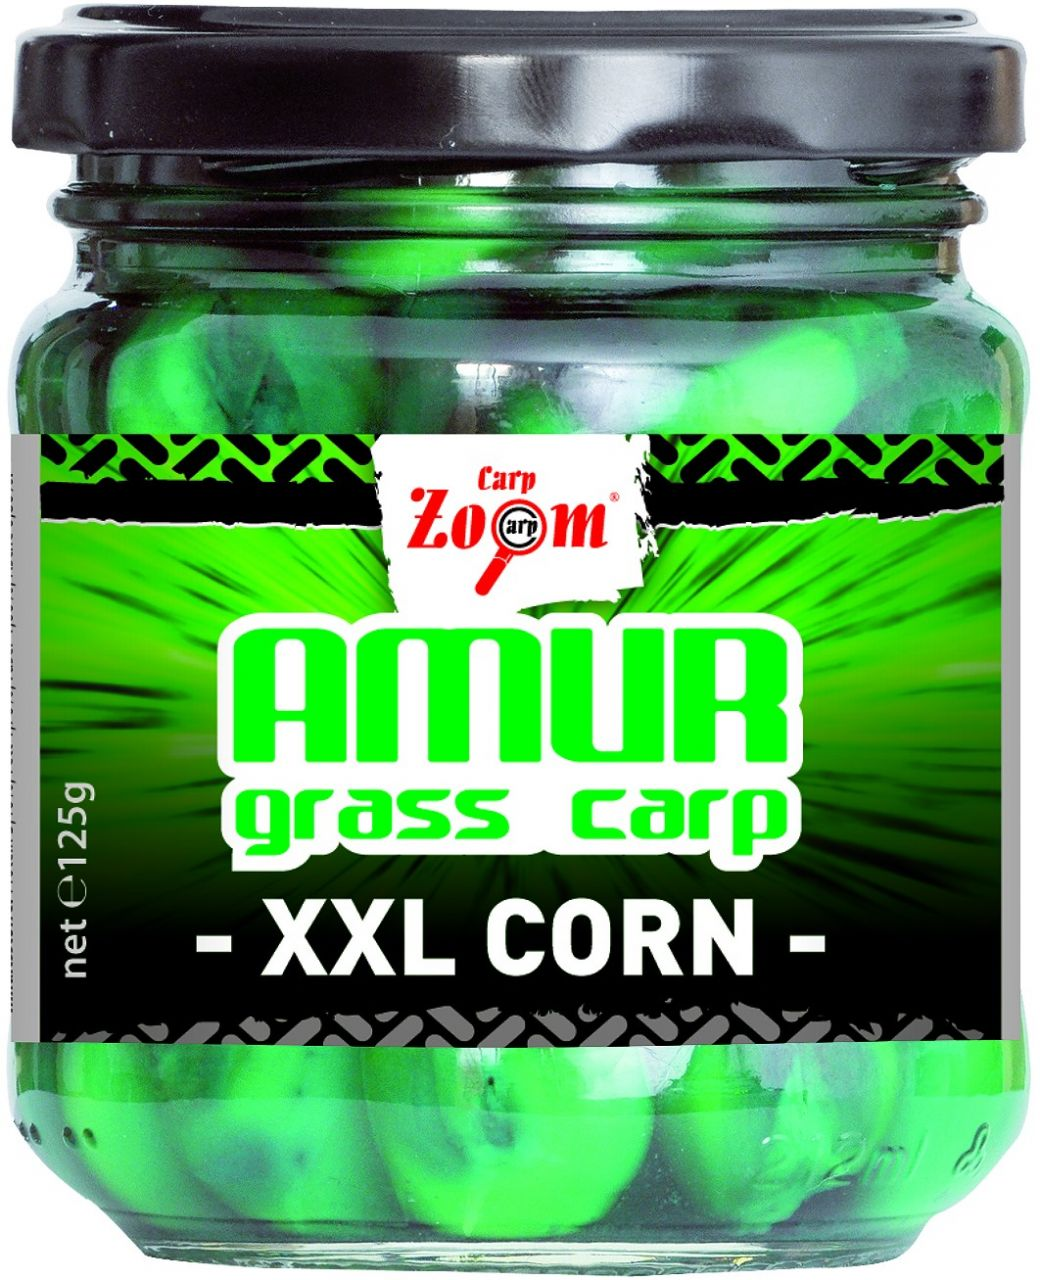 Carp Zoom Amur XXL Corn 220ml